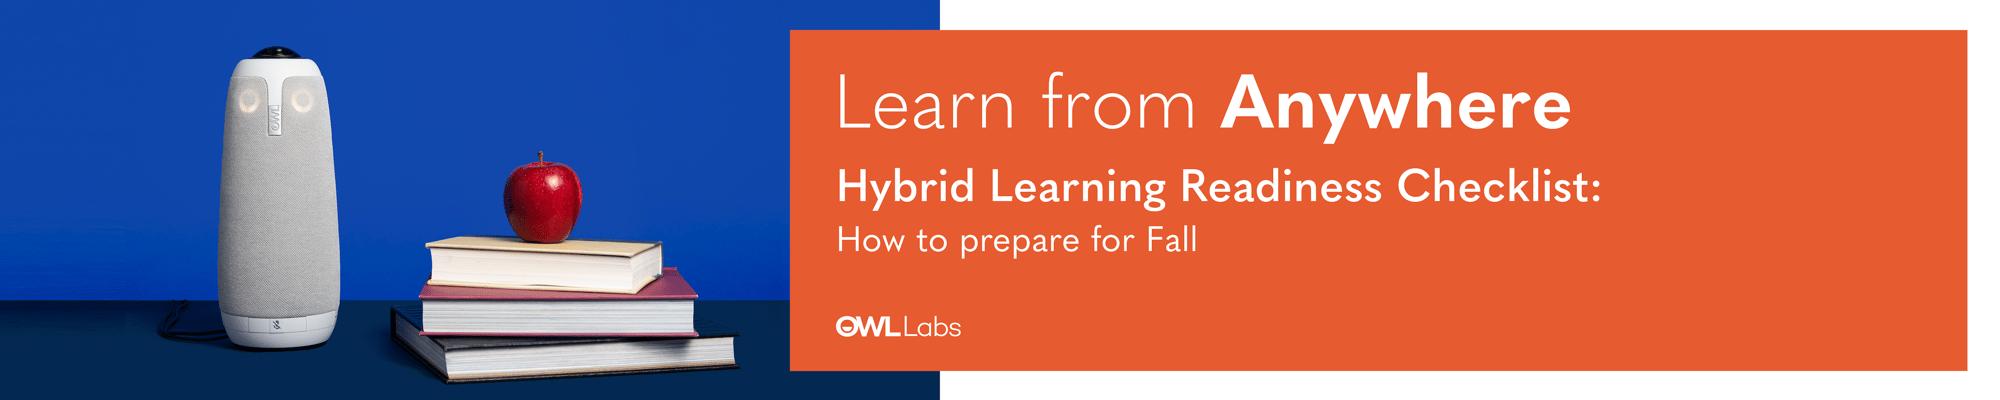 Hybrid Learning Checklist LP 1